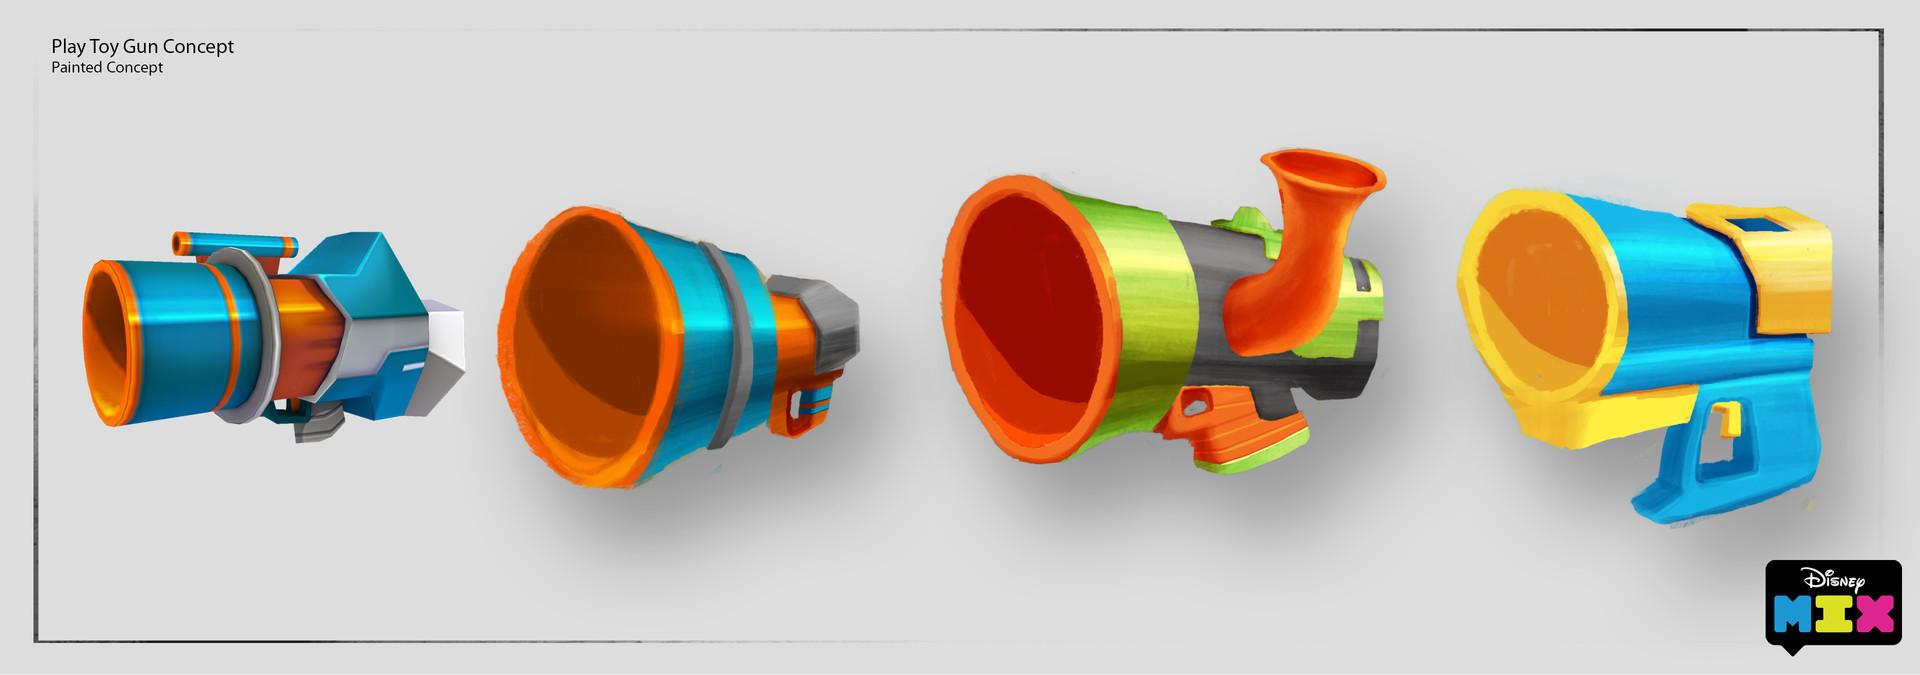 Elvis arevalo mix play toy gun concept